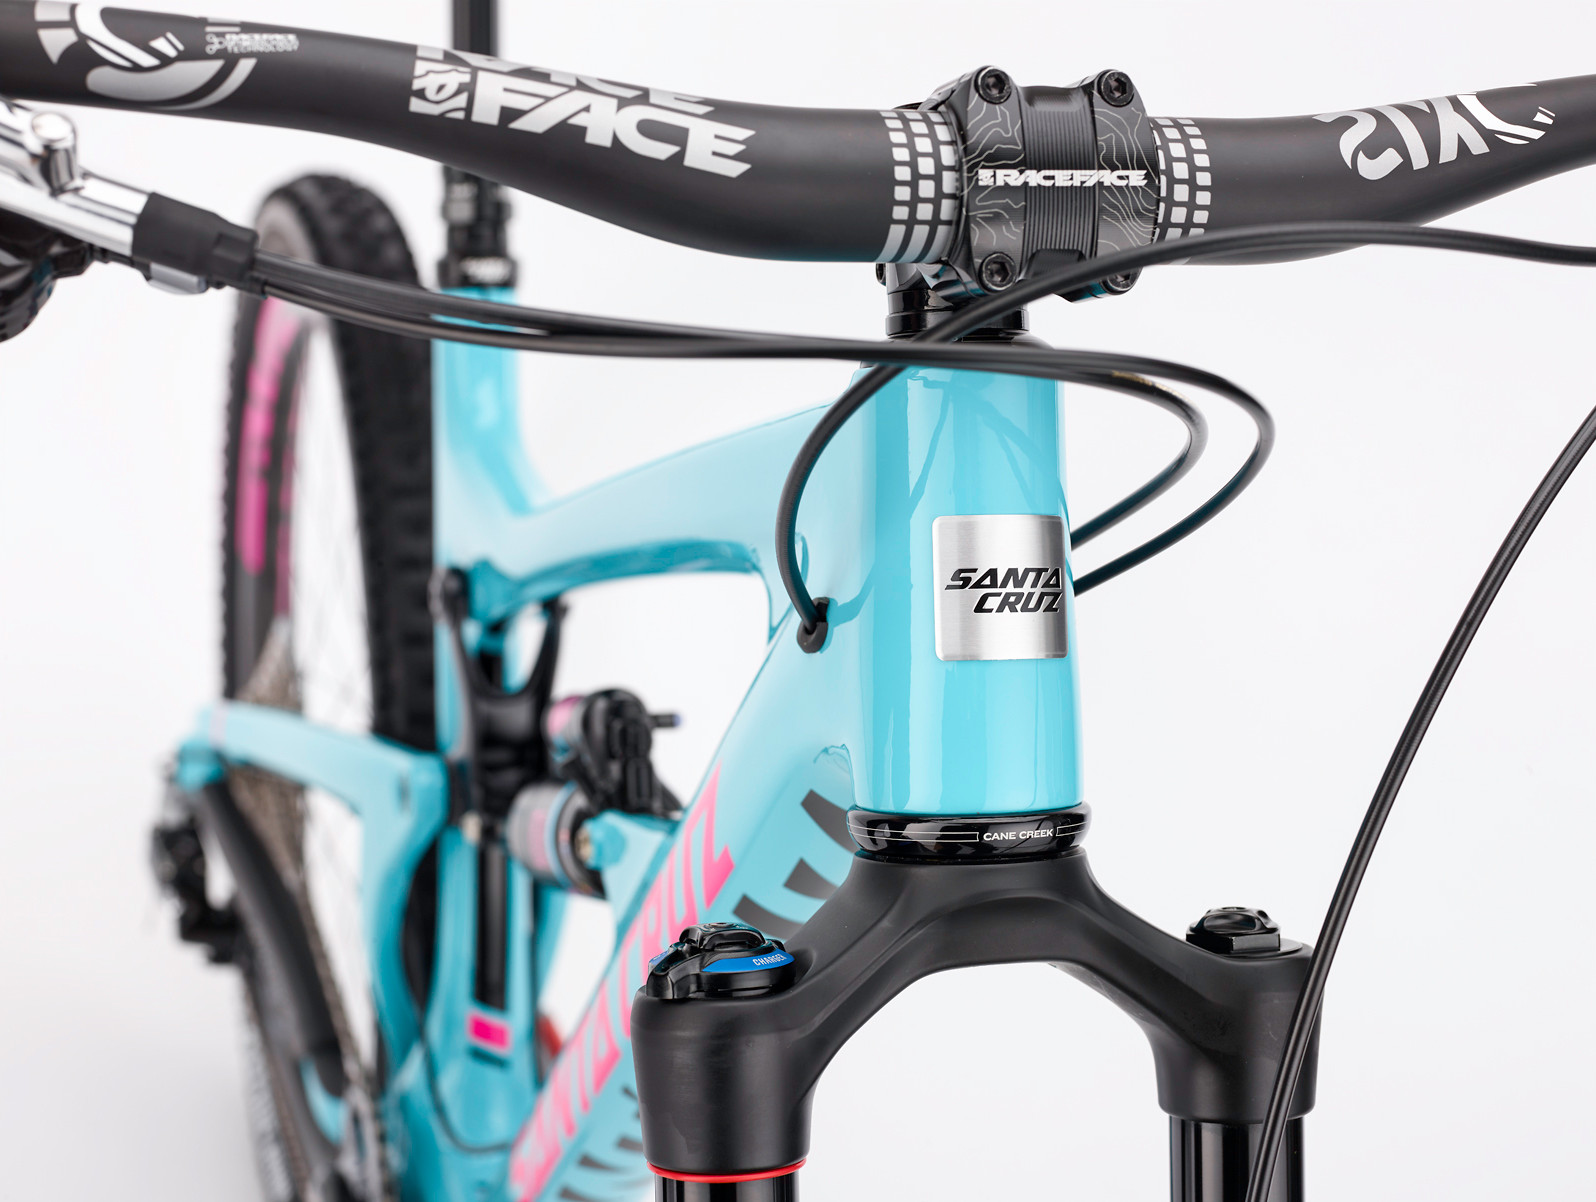 2015 Santa Cruz Nomad Carbon X01 AM Bike - Reviews ...